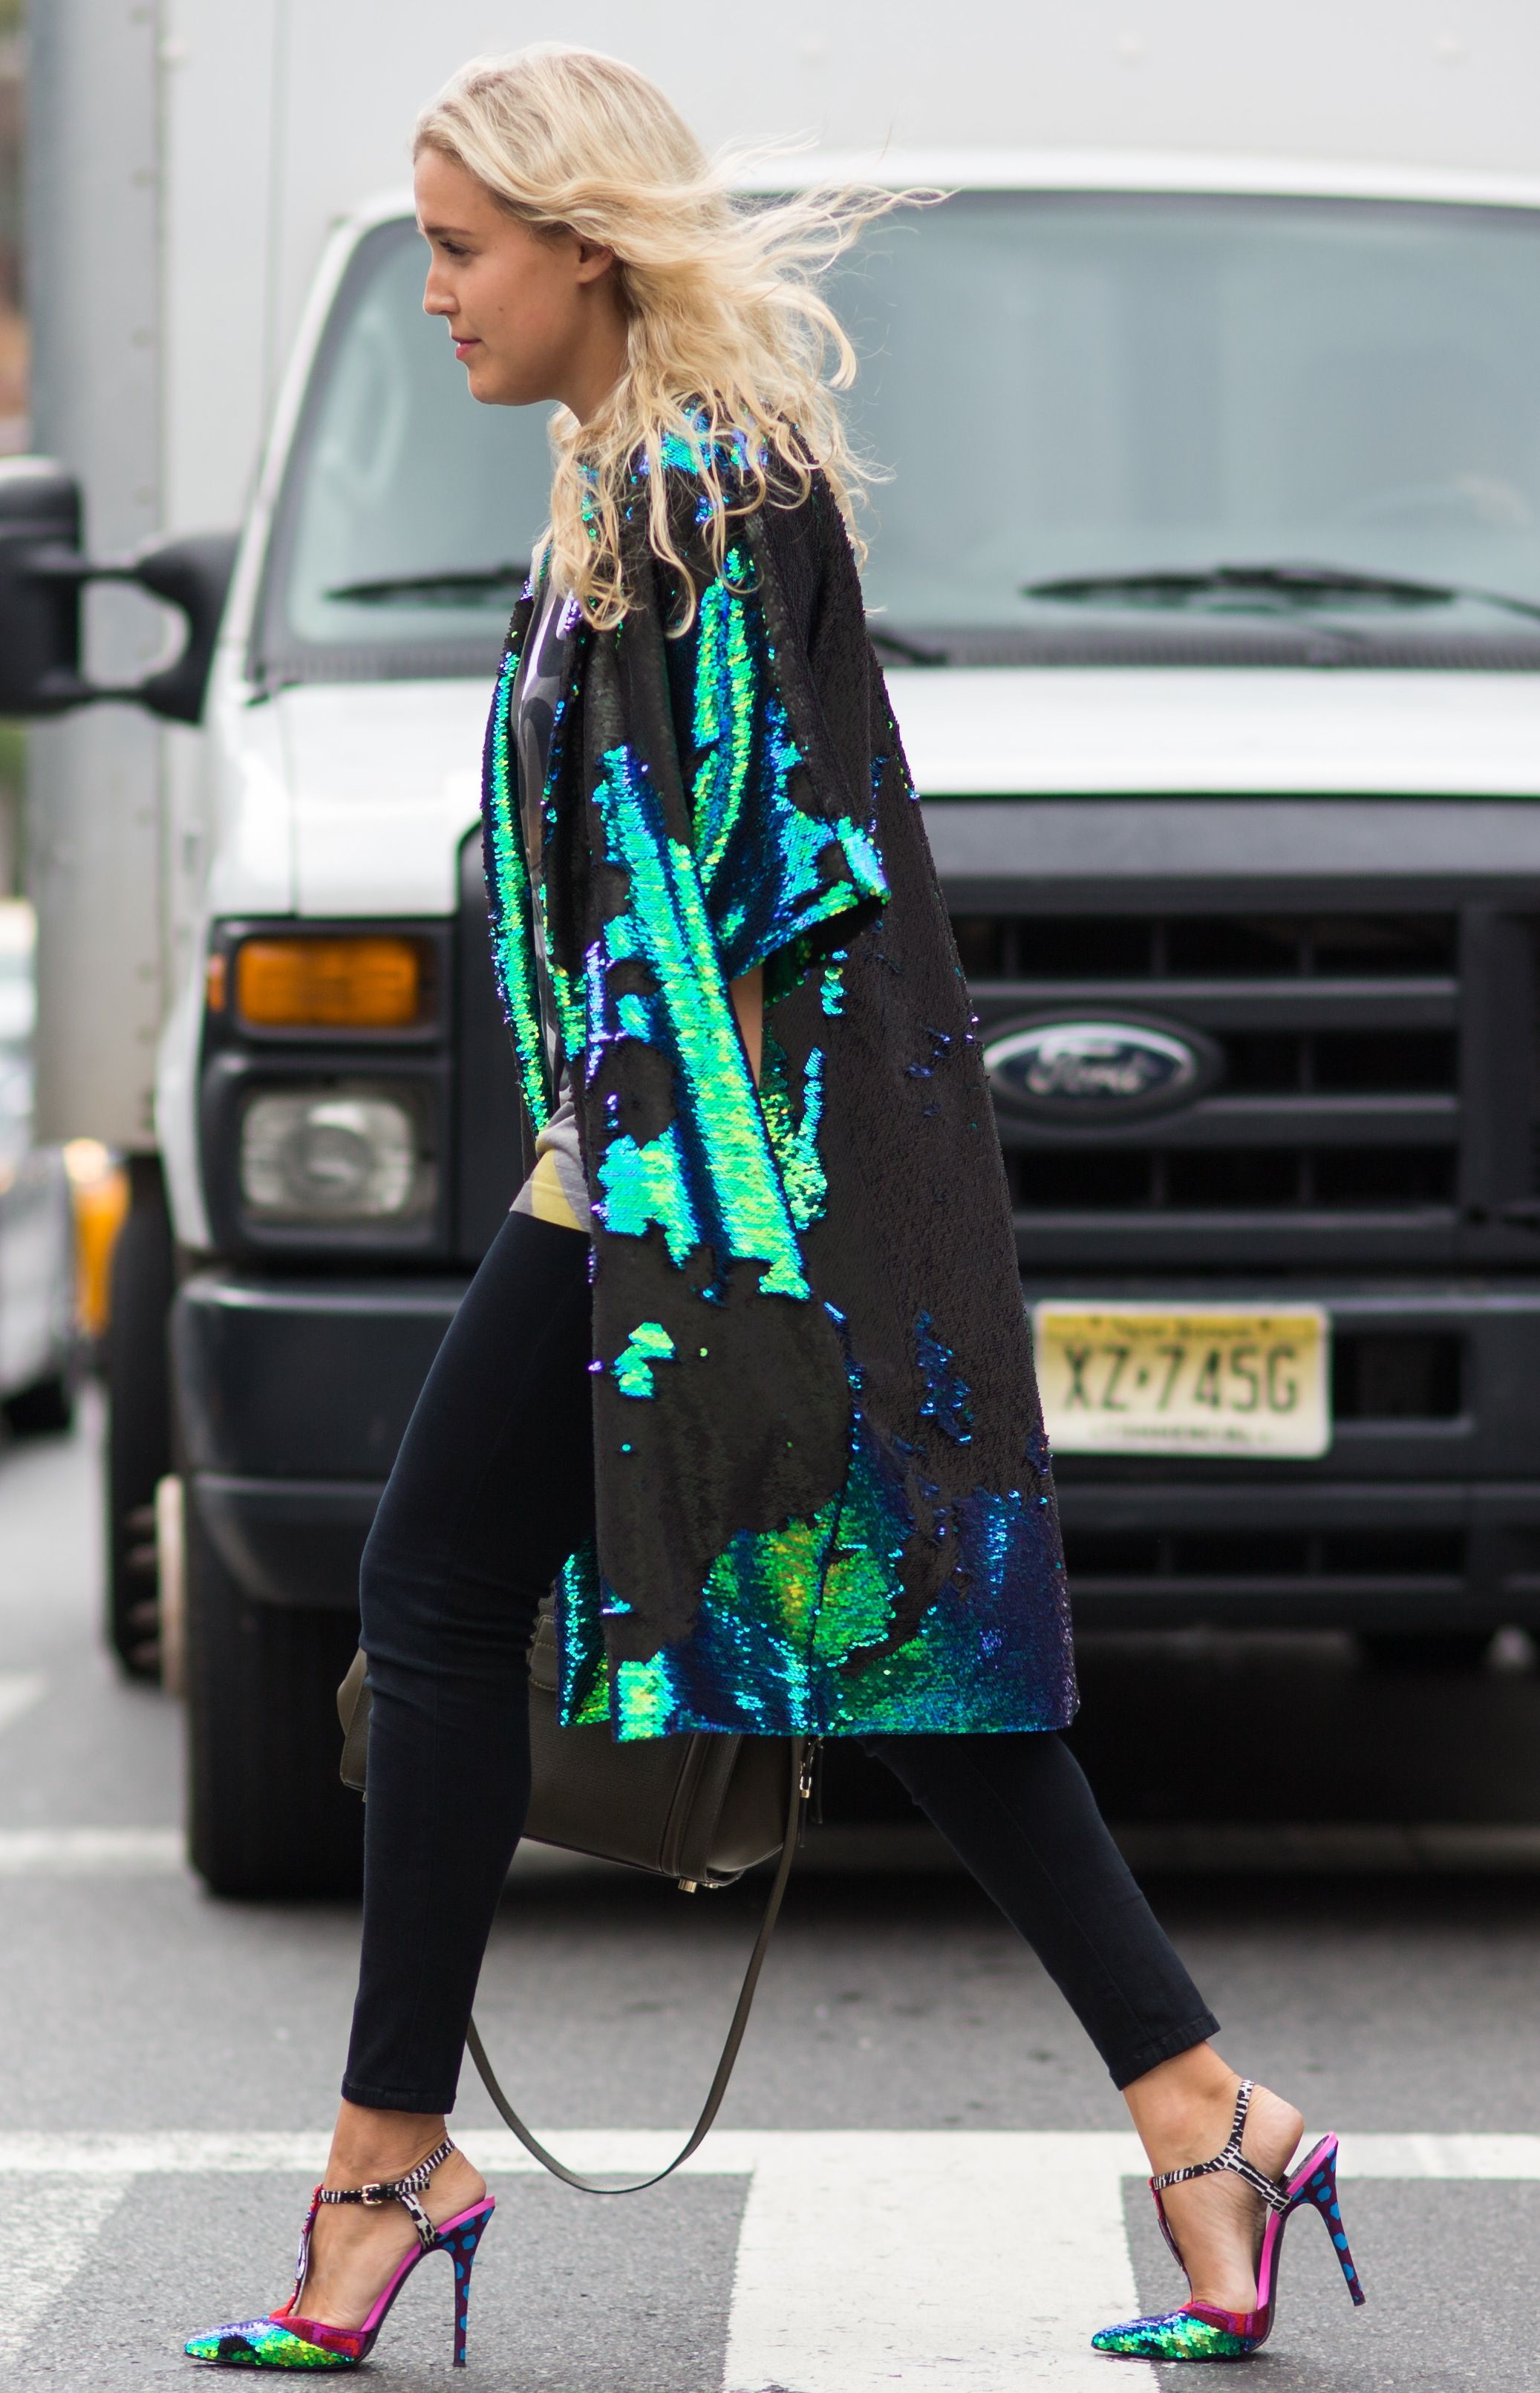 Blue-green sequin coat/jeans/heels/street style